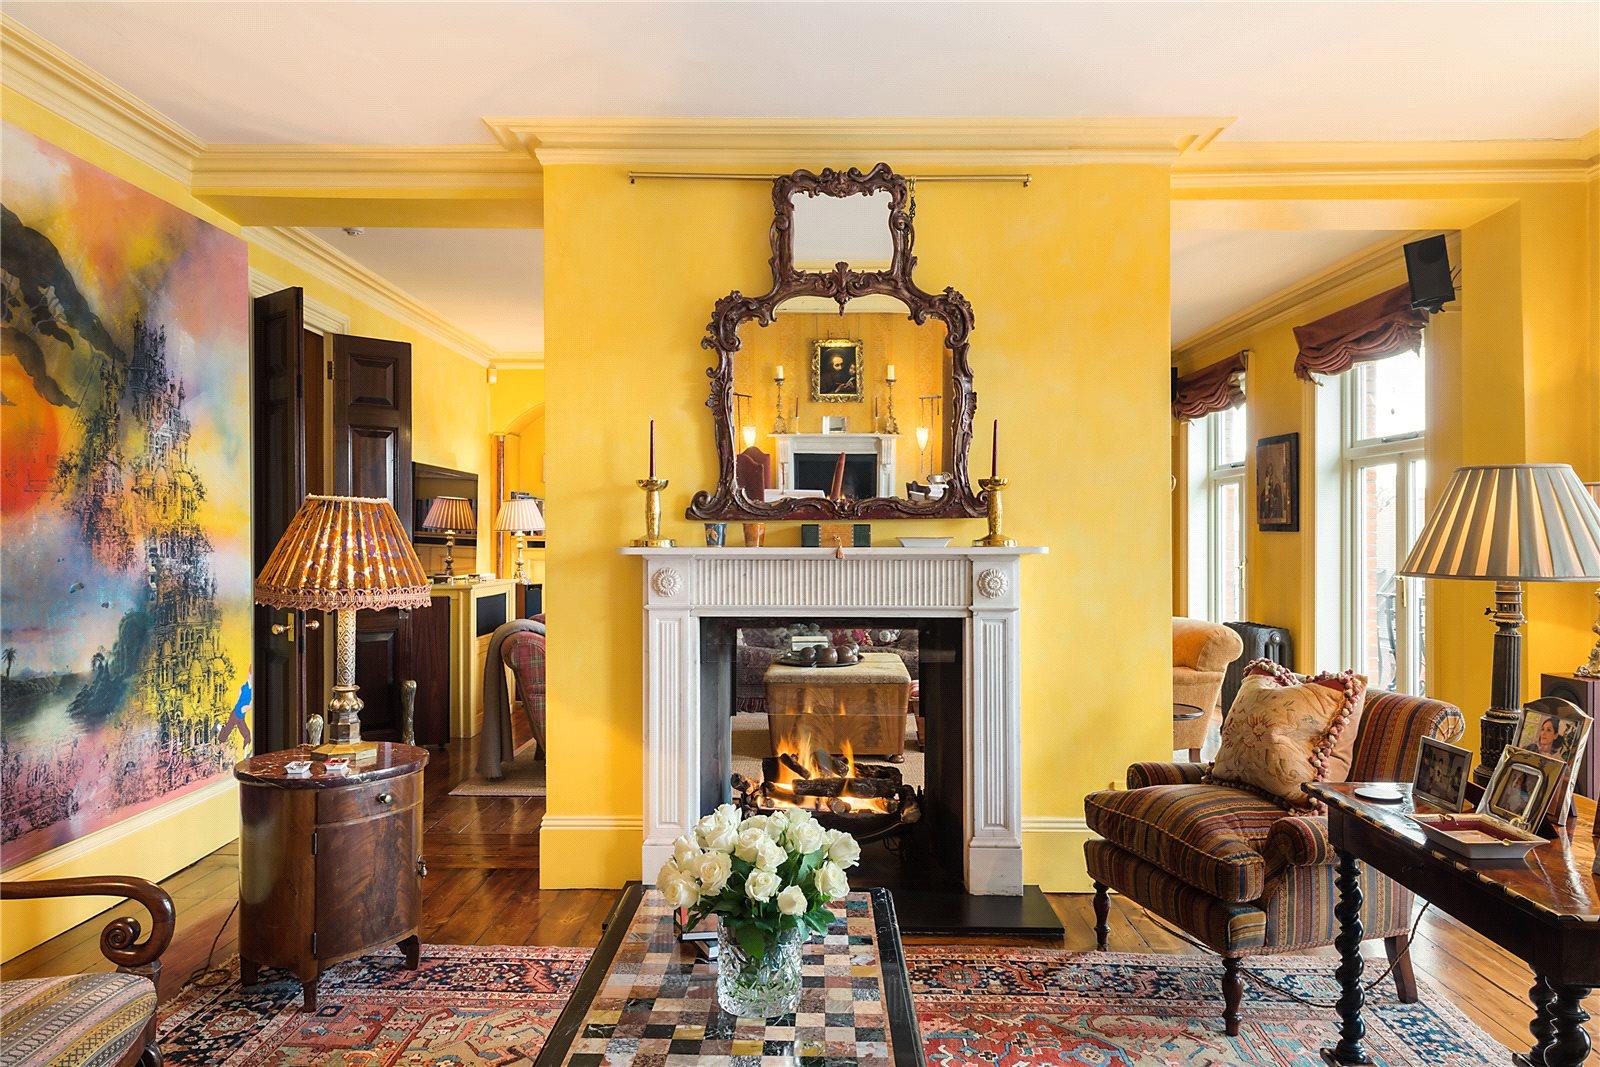 Apartamentos para Venda às Drayton Gardens, Chelsea, London, SW10 Chelsea, London, Inglaterra